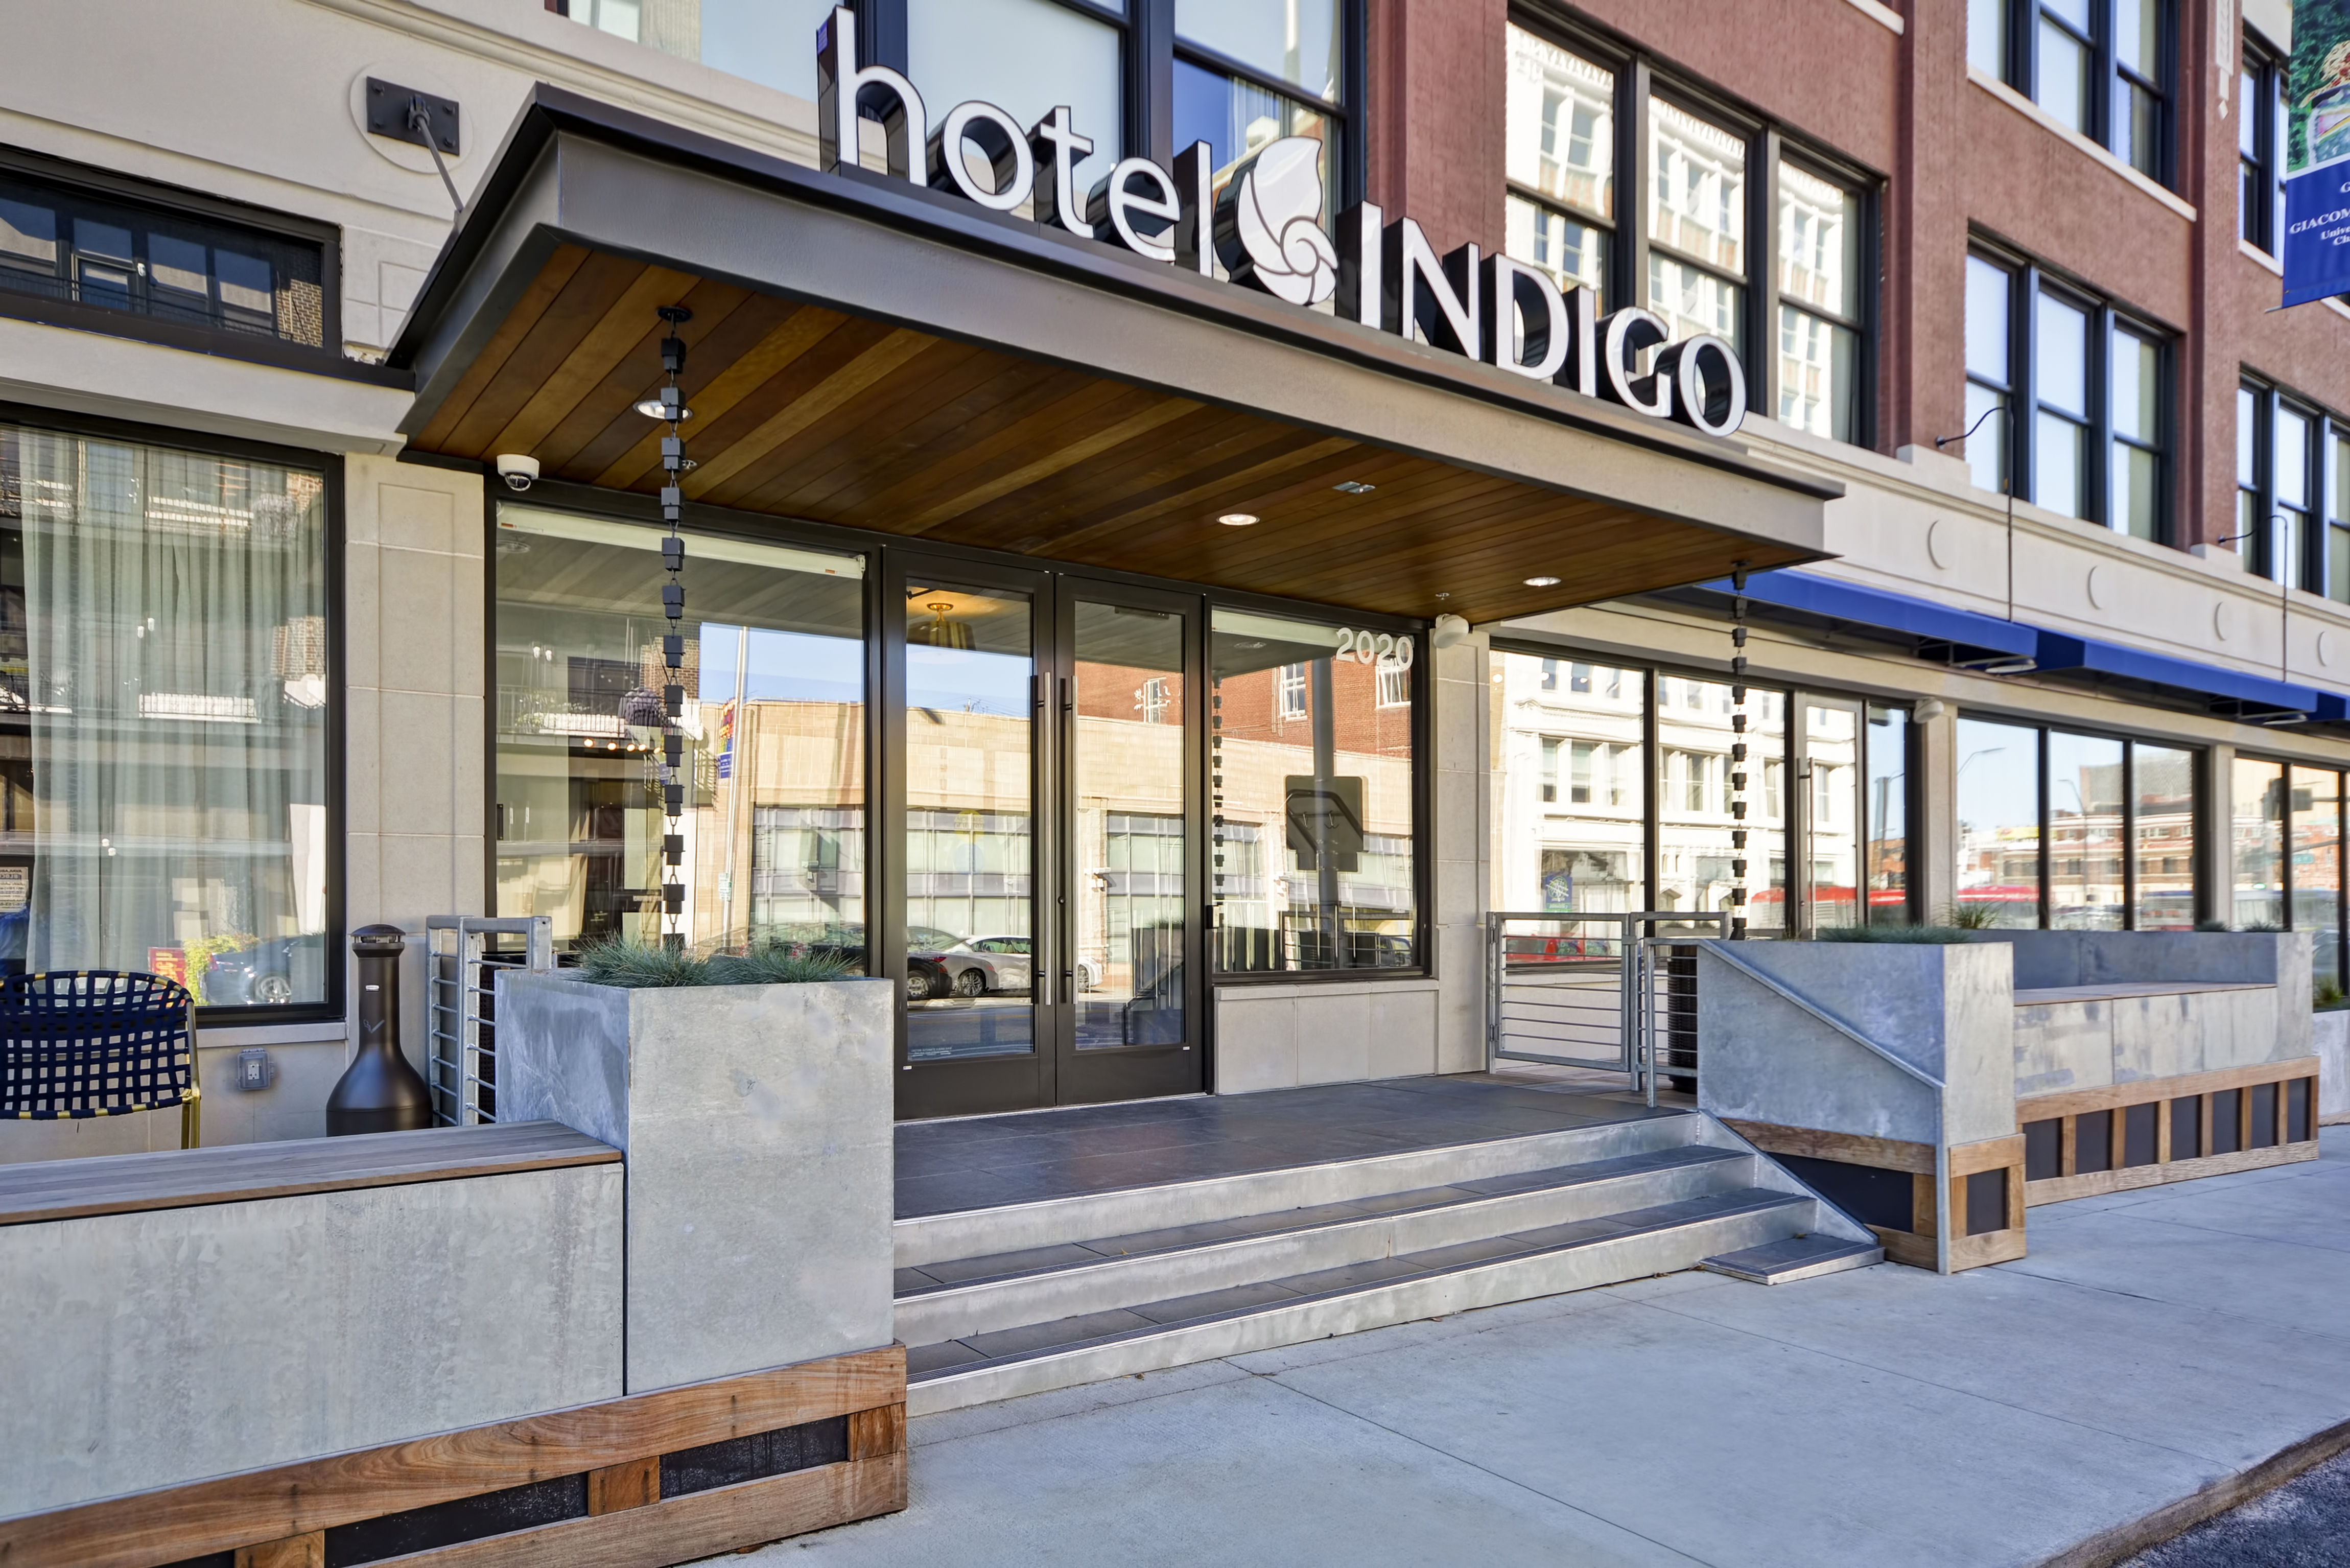 Hotel Indigo - Crossroads